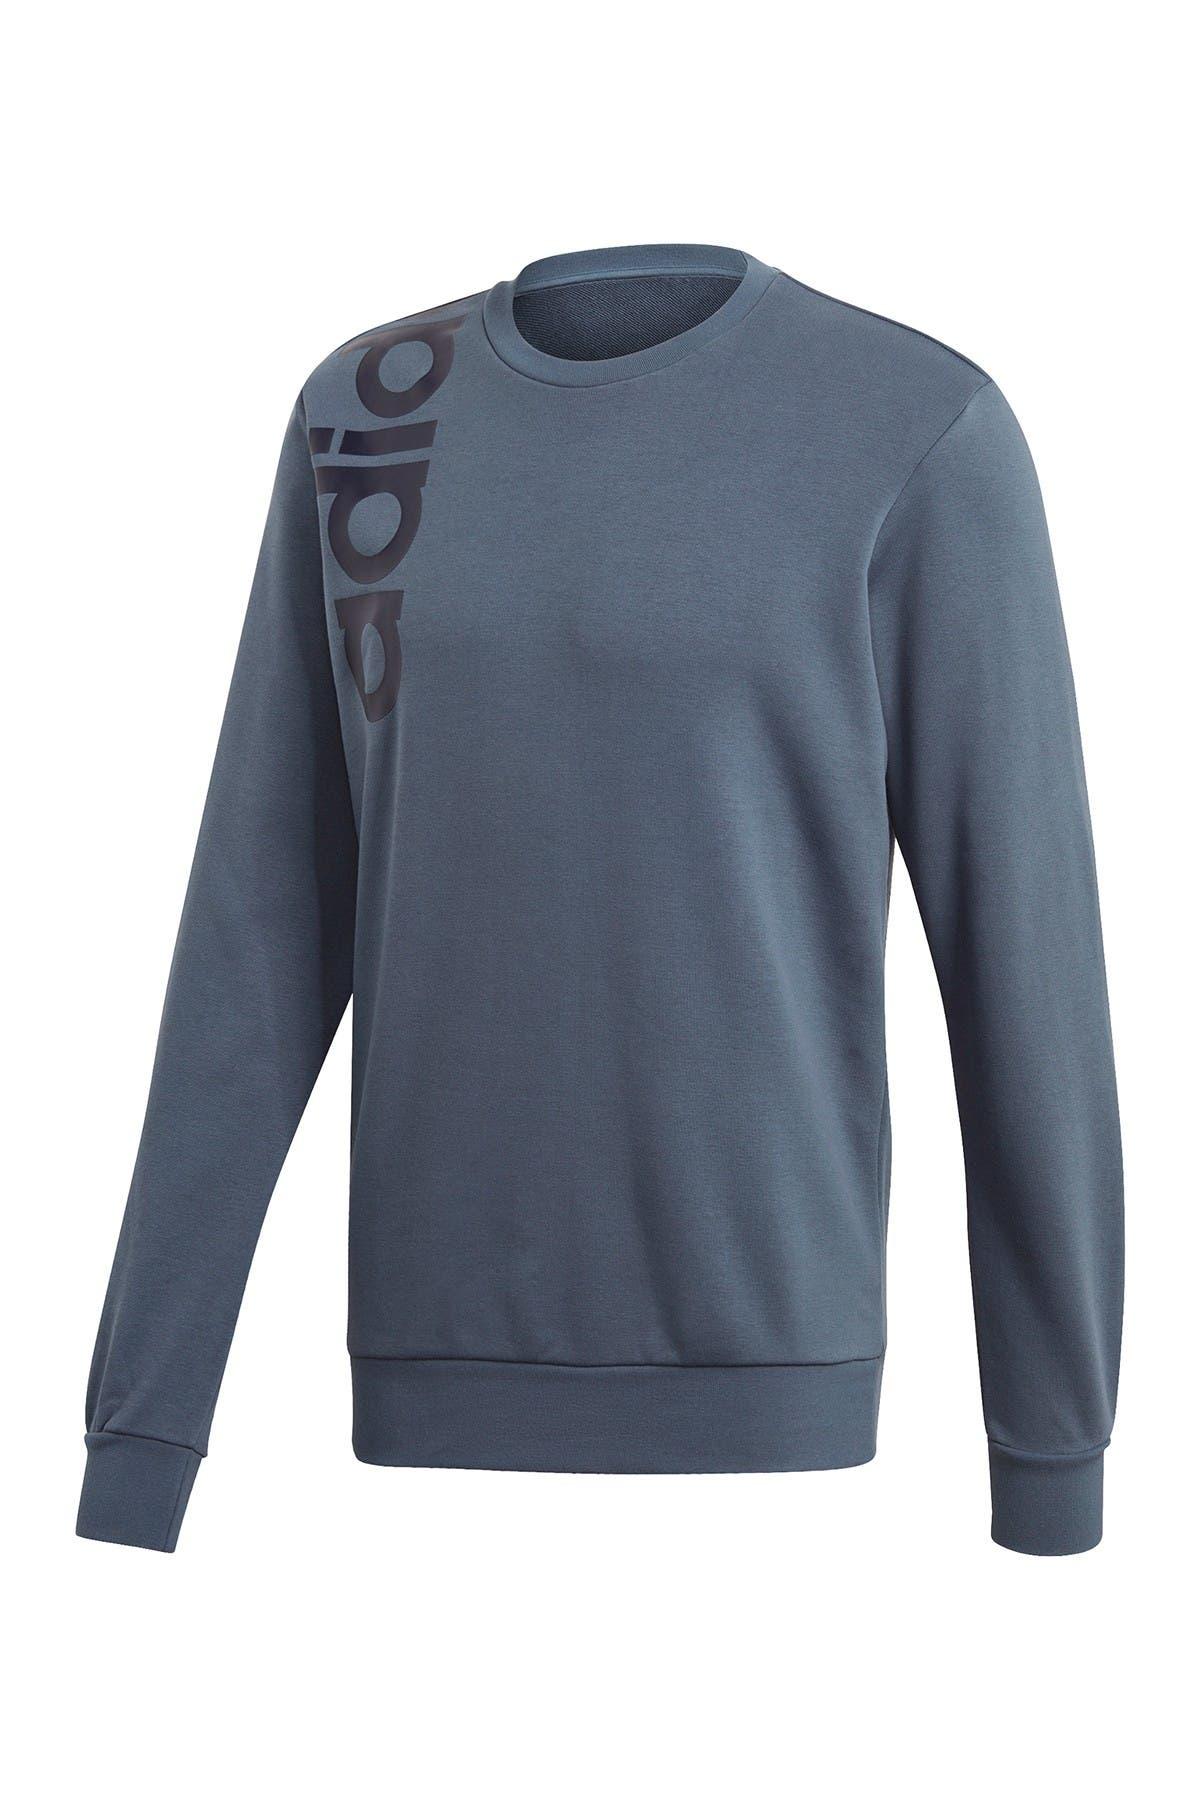 Image of adidas Crew Neck Pullover Sweatshirt